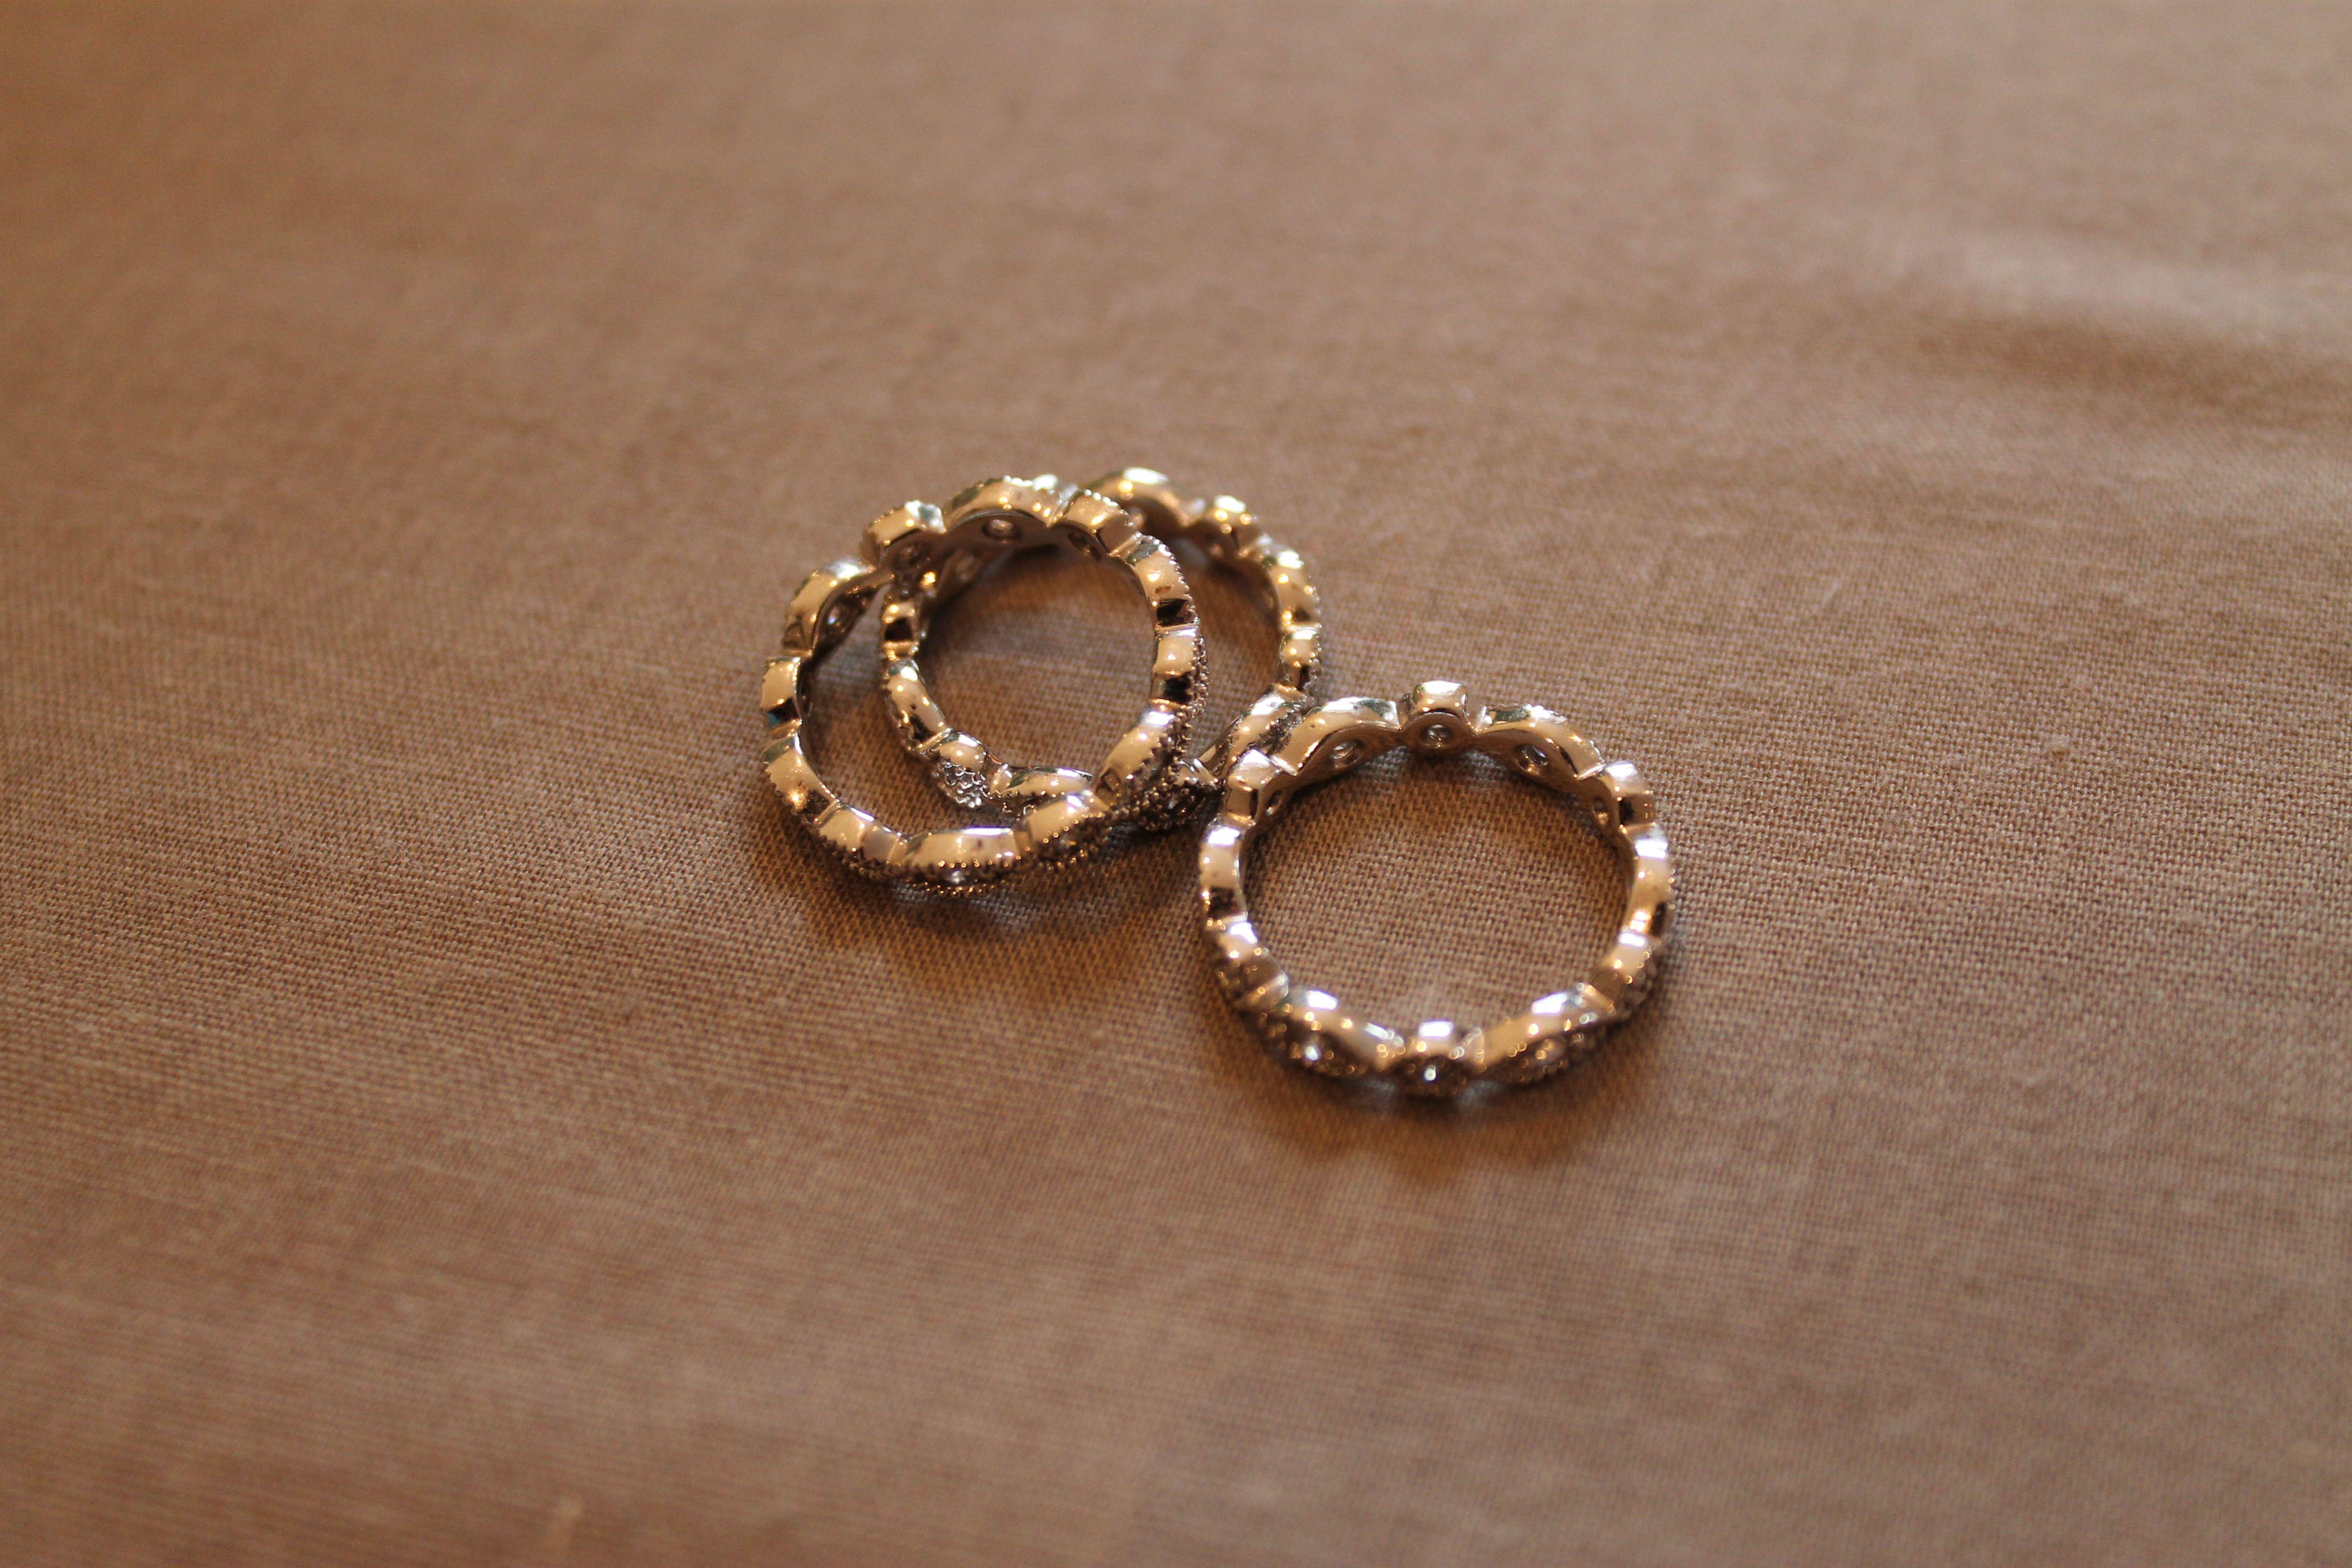 stakable deco rings (£40)